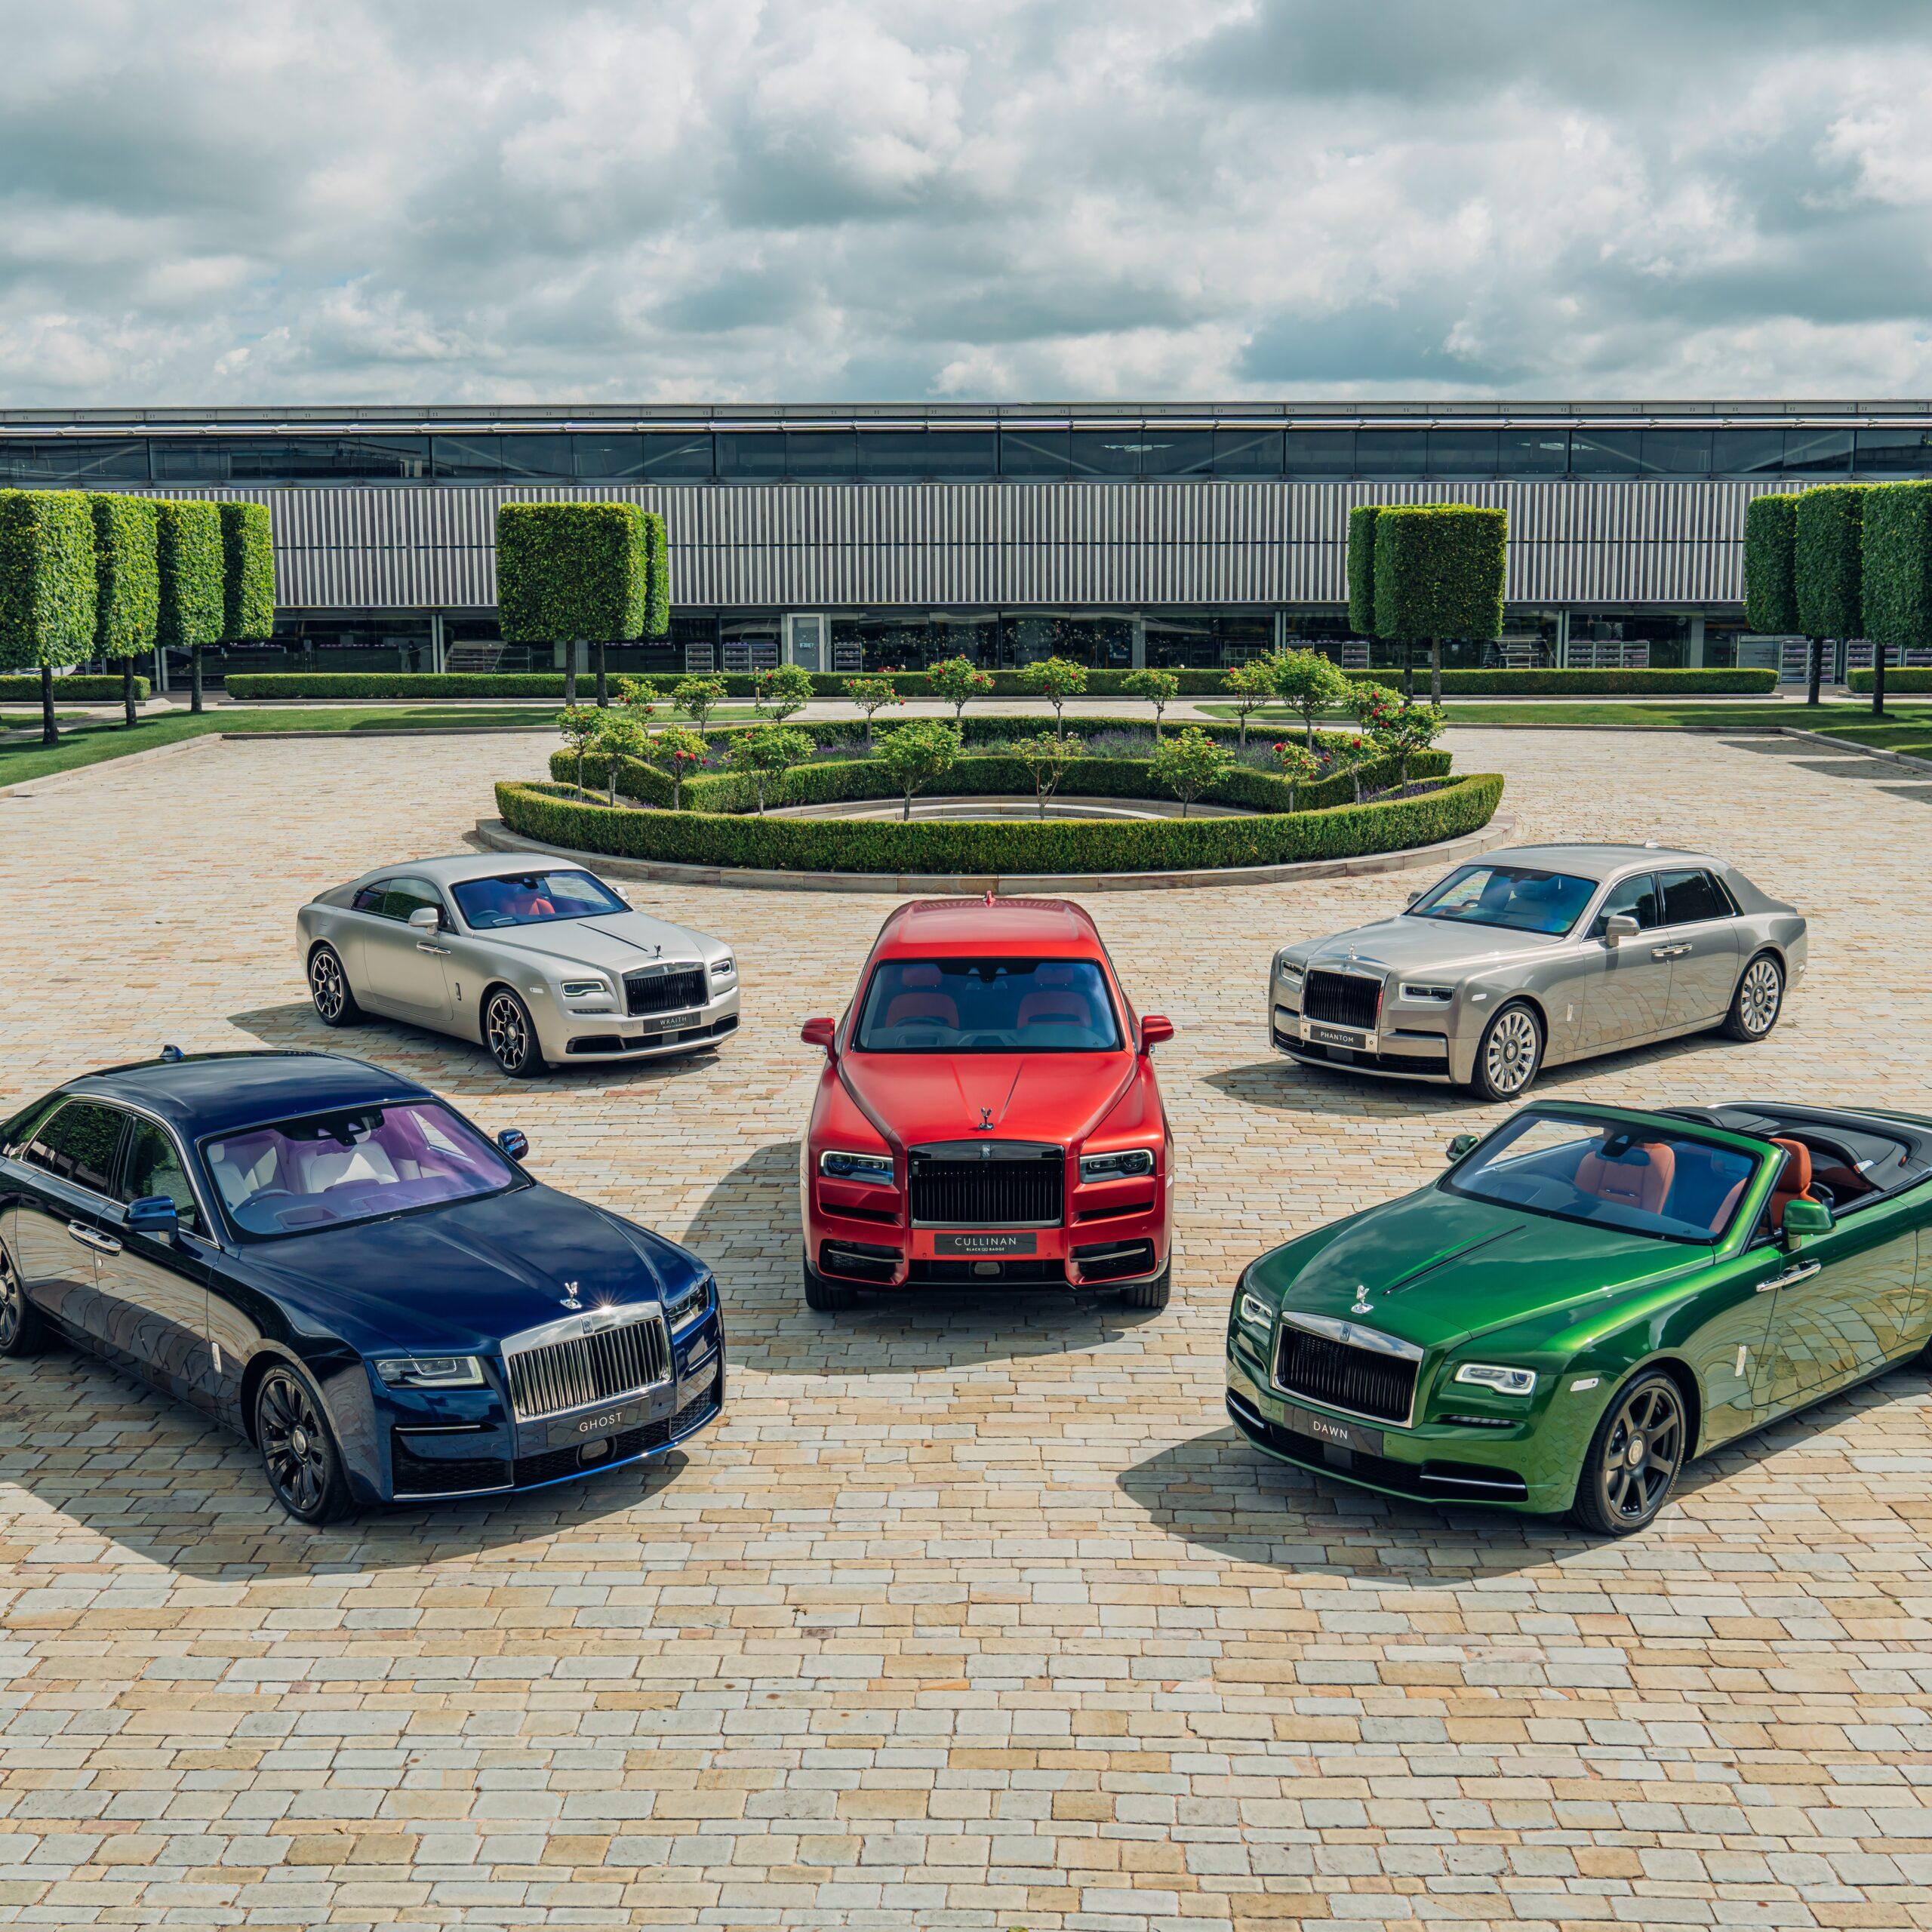 Rolls Royce via Rolls Royce for use by 360 Magazine